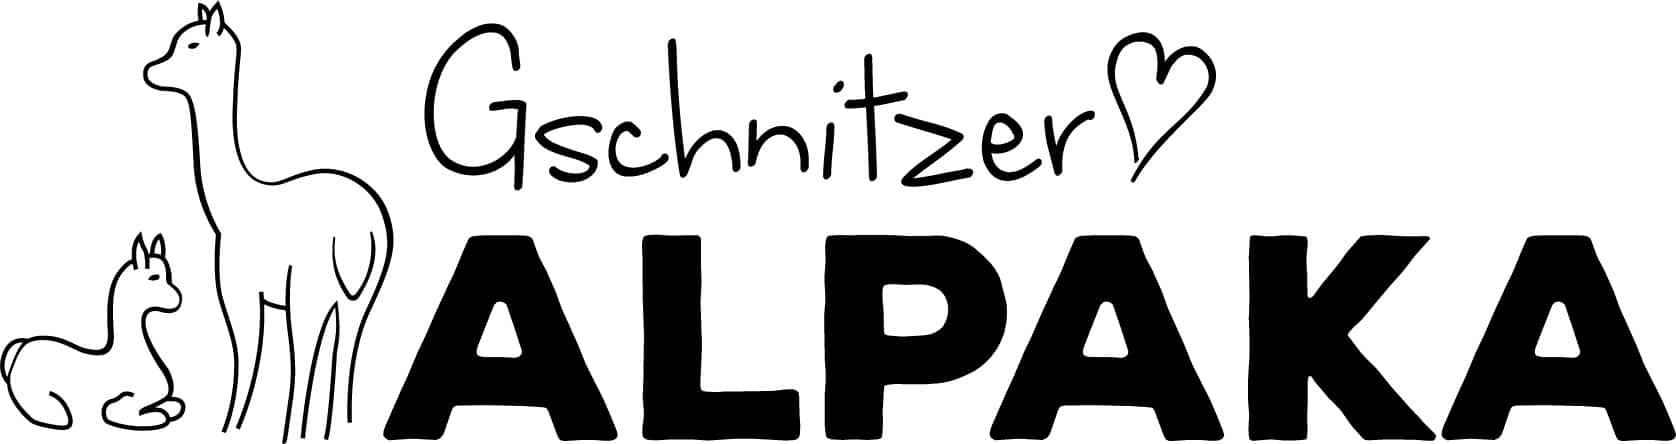 Gschnitzer Alpaka - www.alpaka.tirol